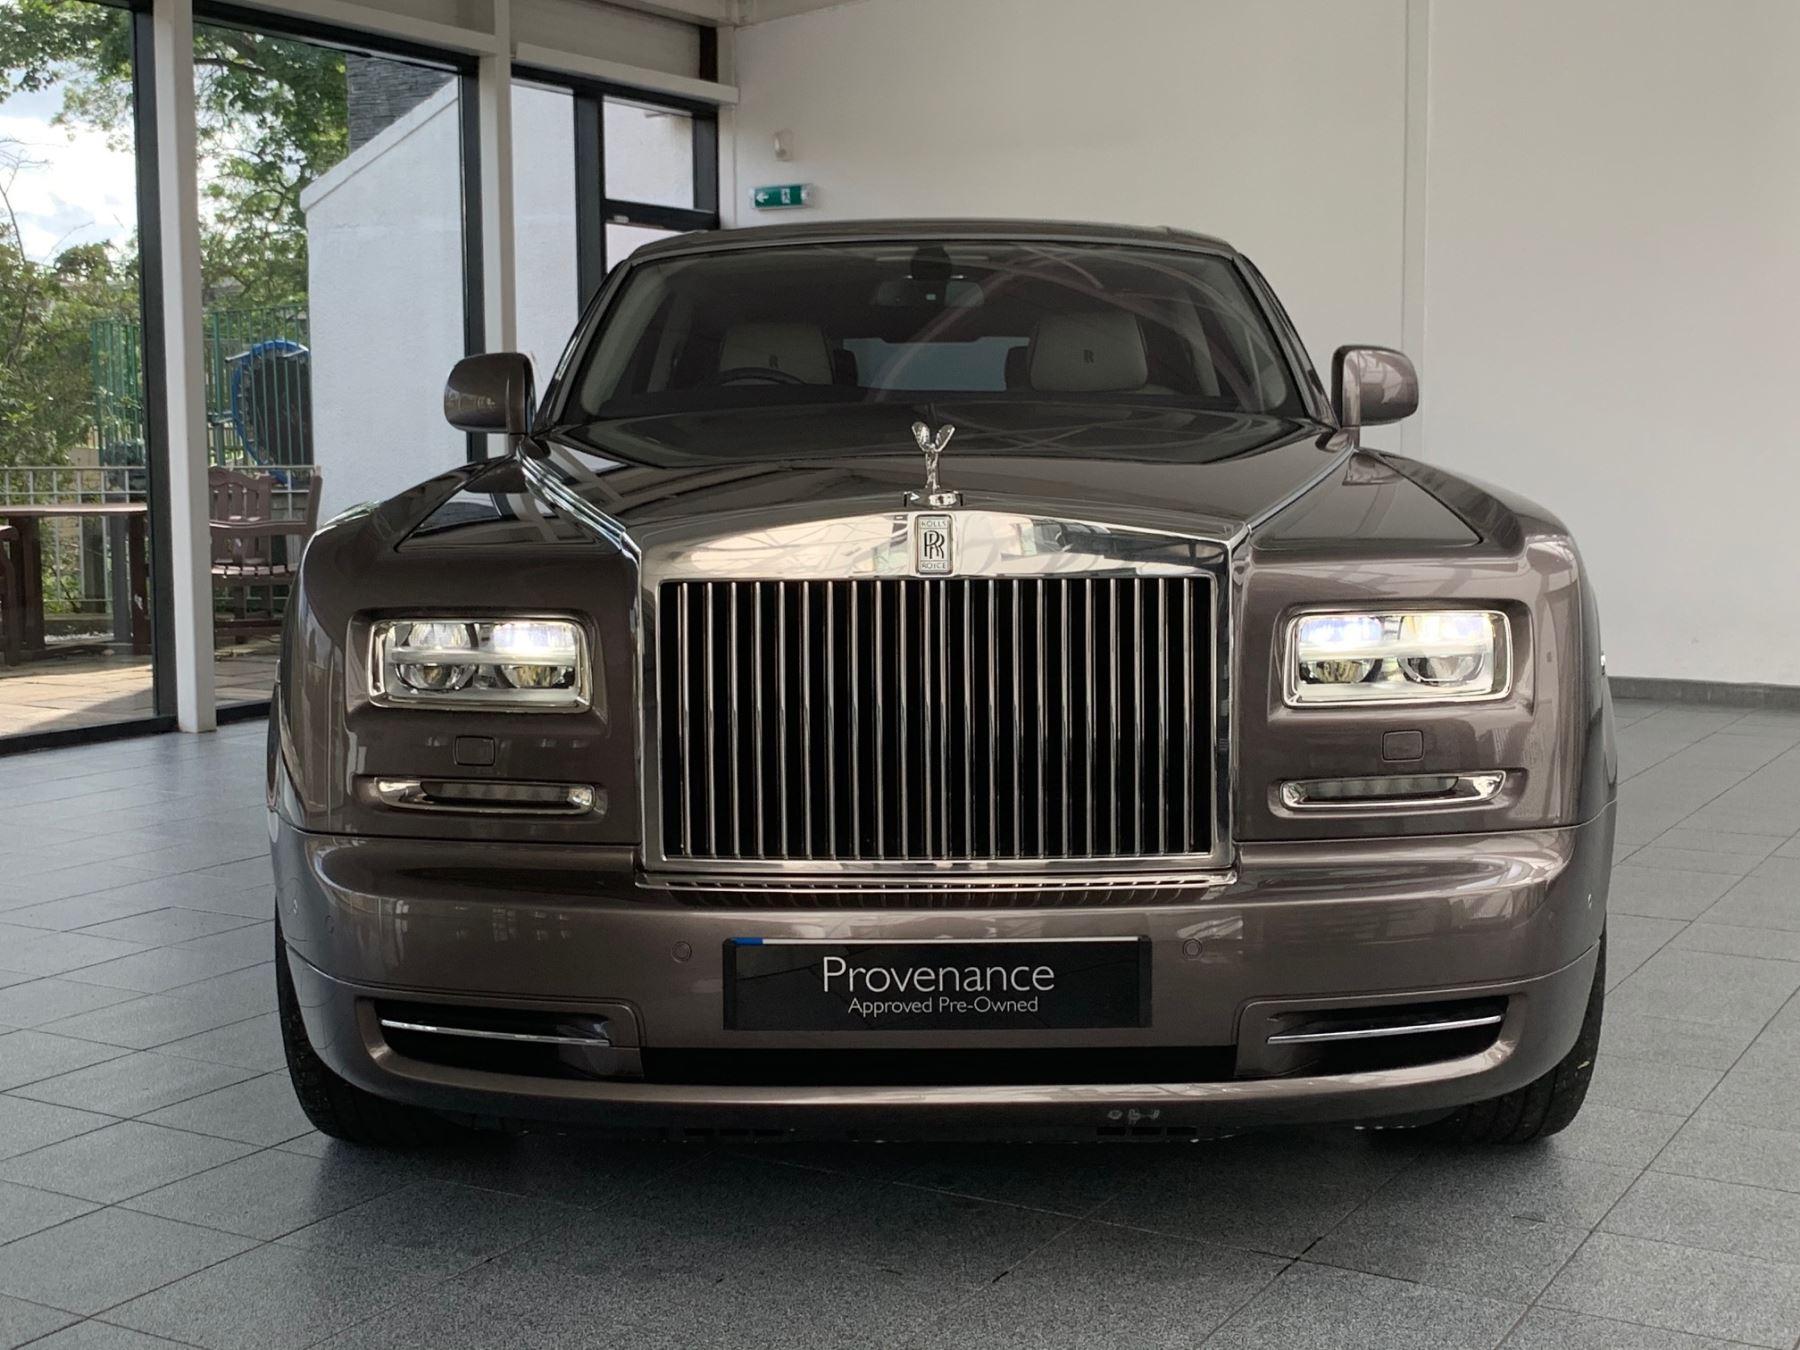 Rolls-Royce Phantom Extended Wheelbase II 4dr Auto Extended Wheel Base image 3